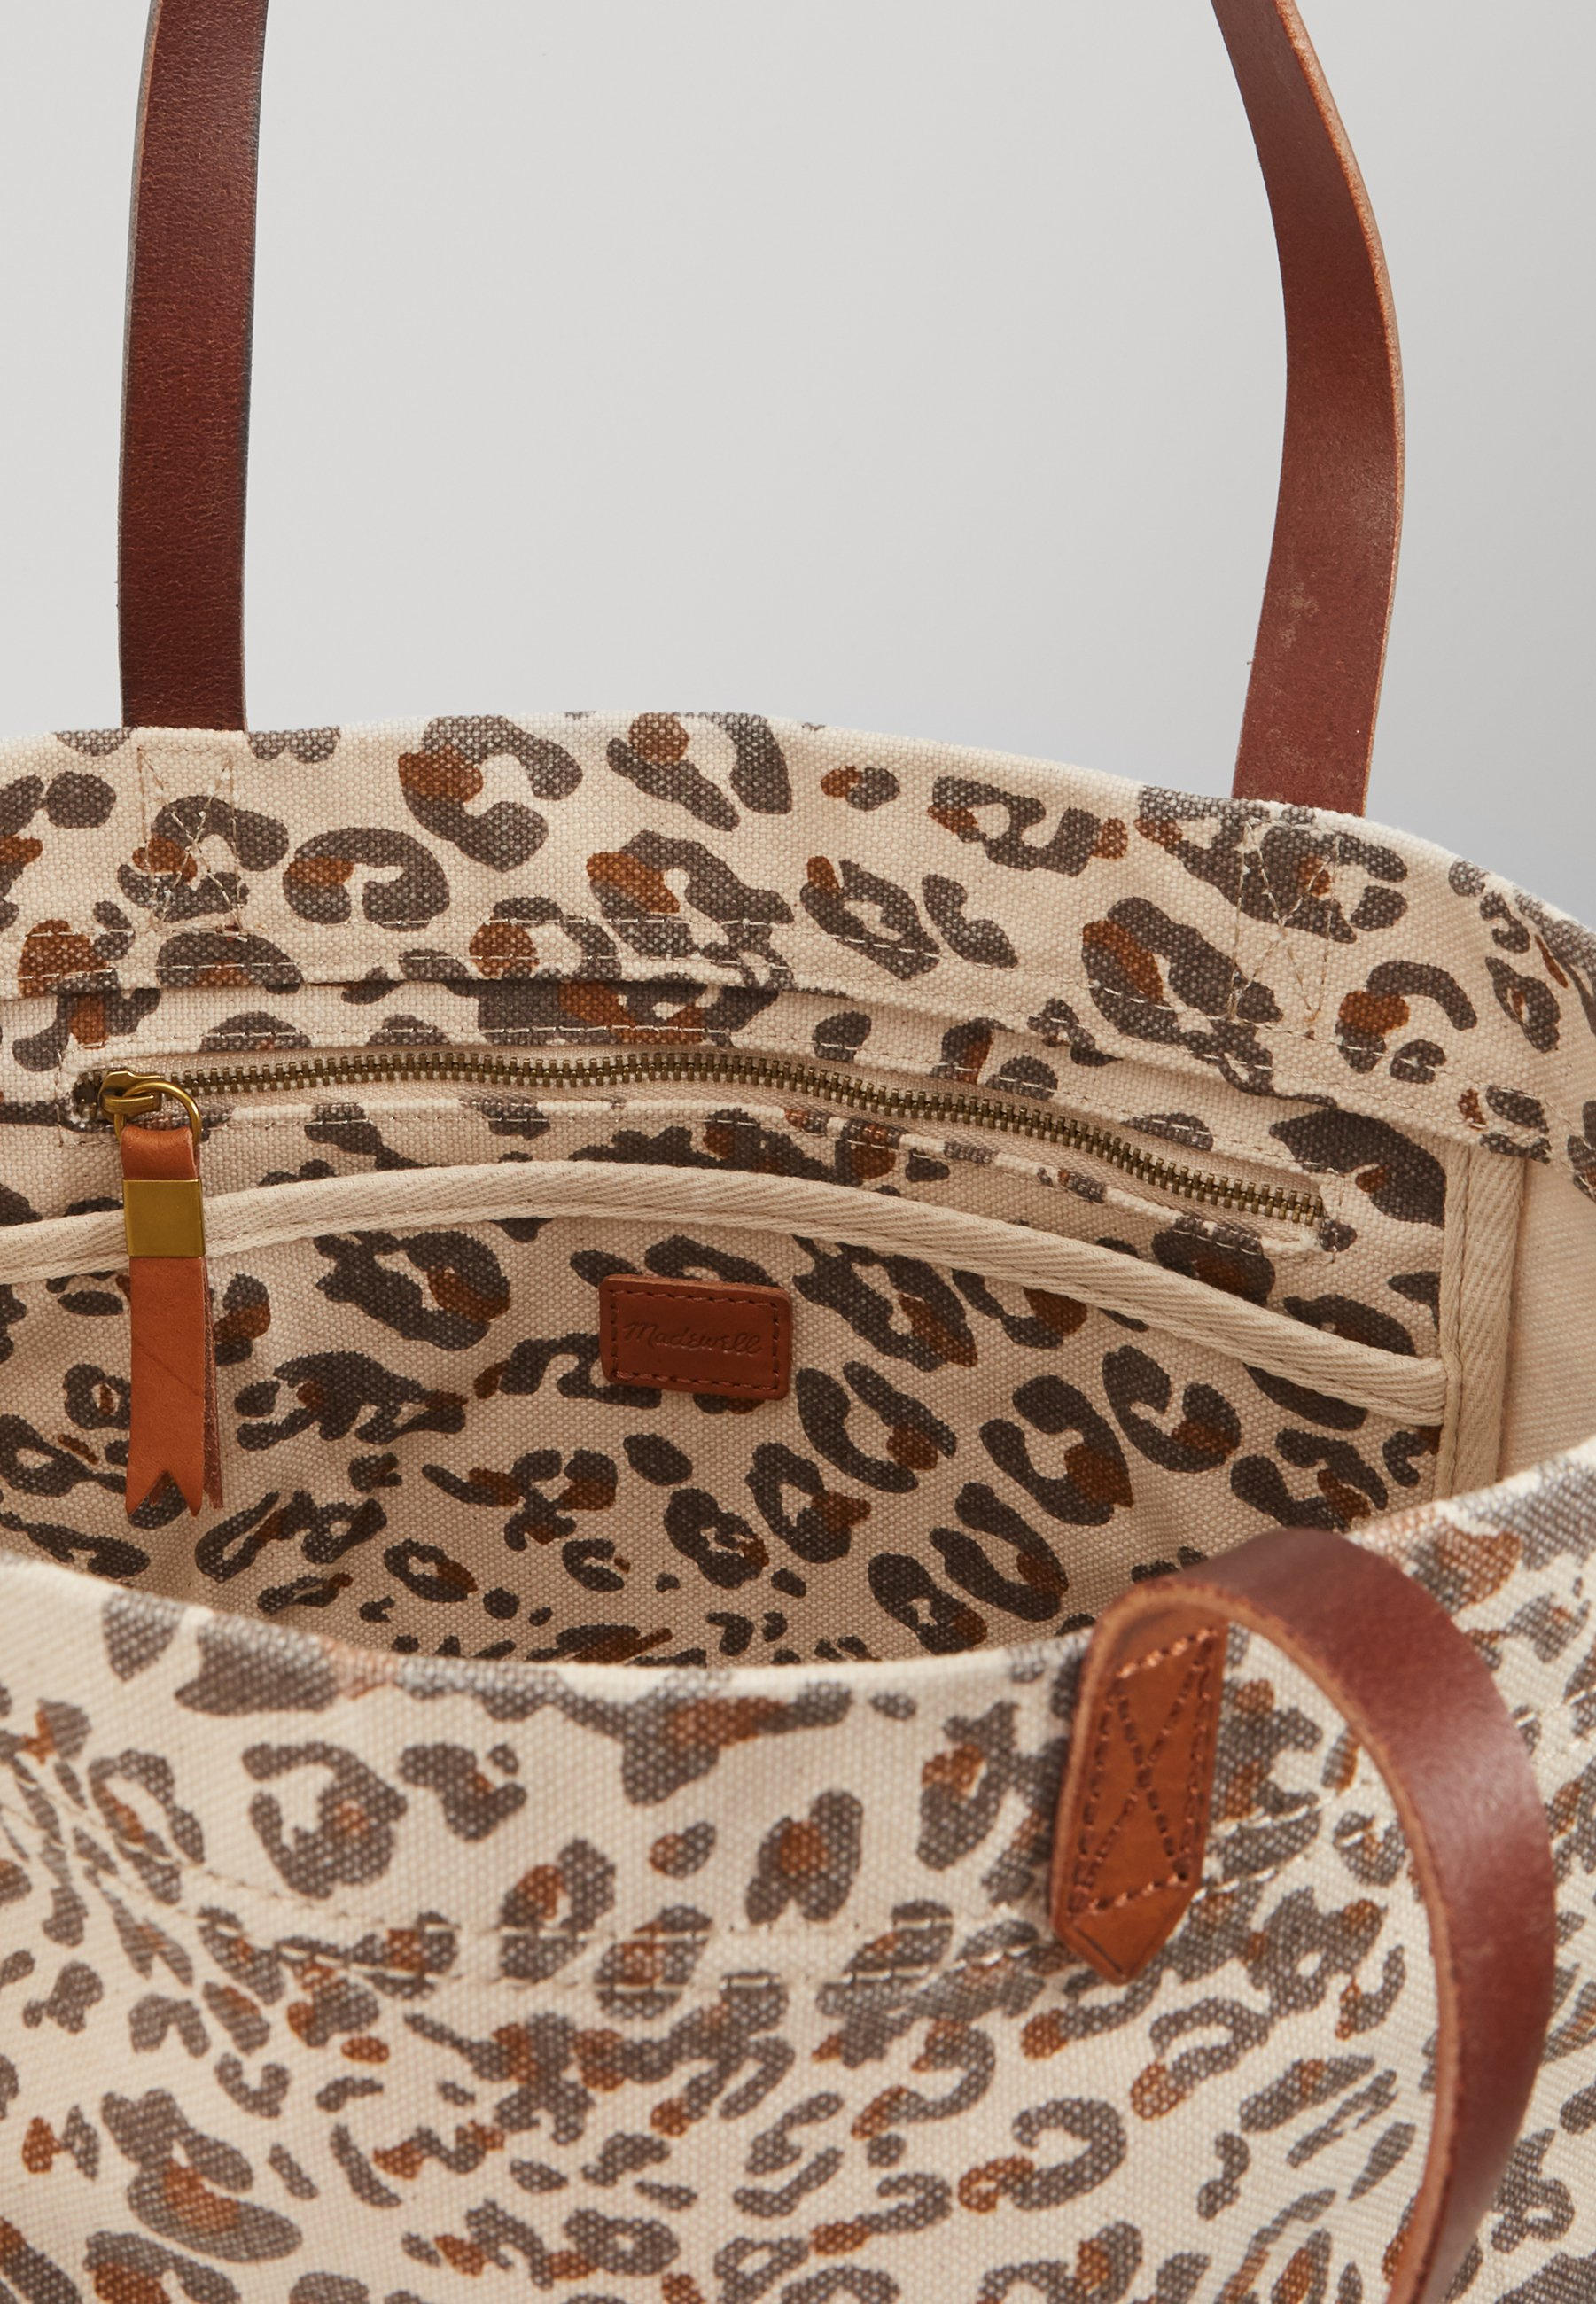 Madewell Shopping Bags - Ashen Sand